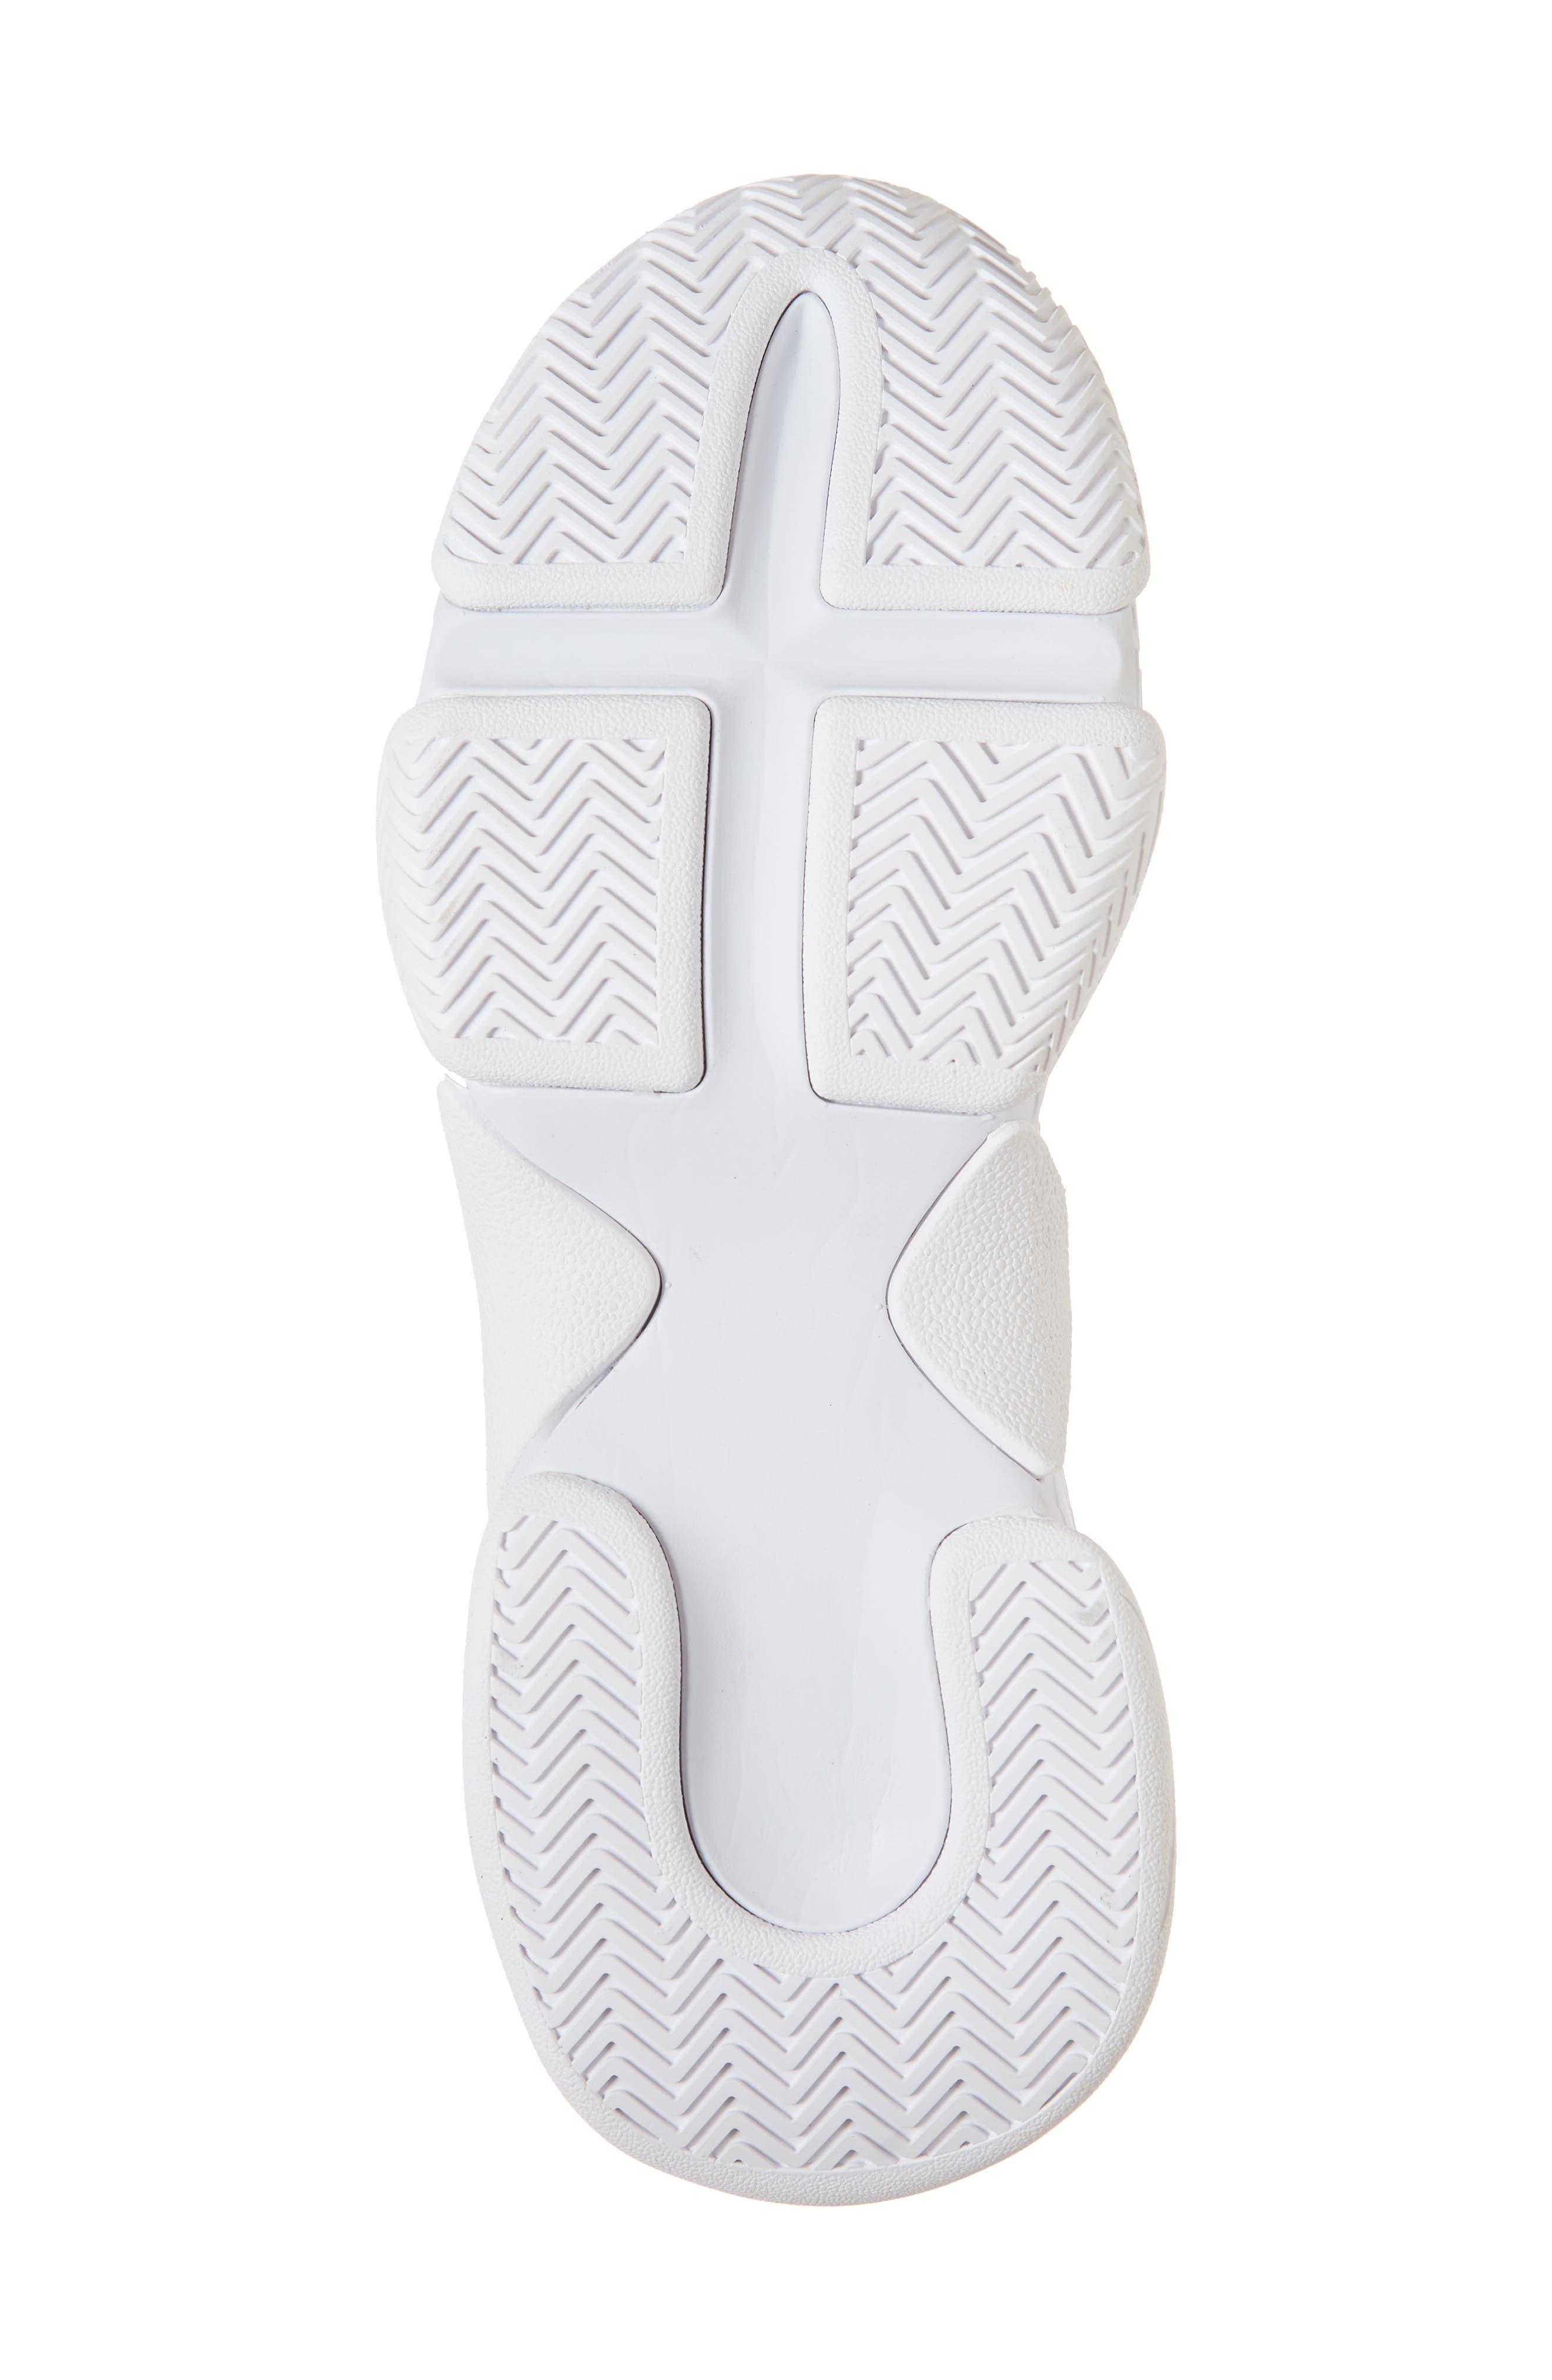 Lo-Fi Sneaker,                             Alternate thumbnail 6, color,                             GOLD CRINKLE